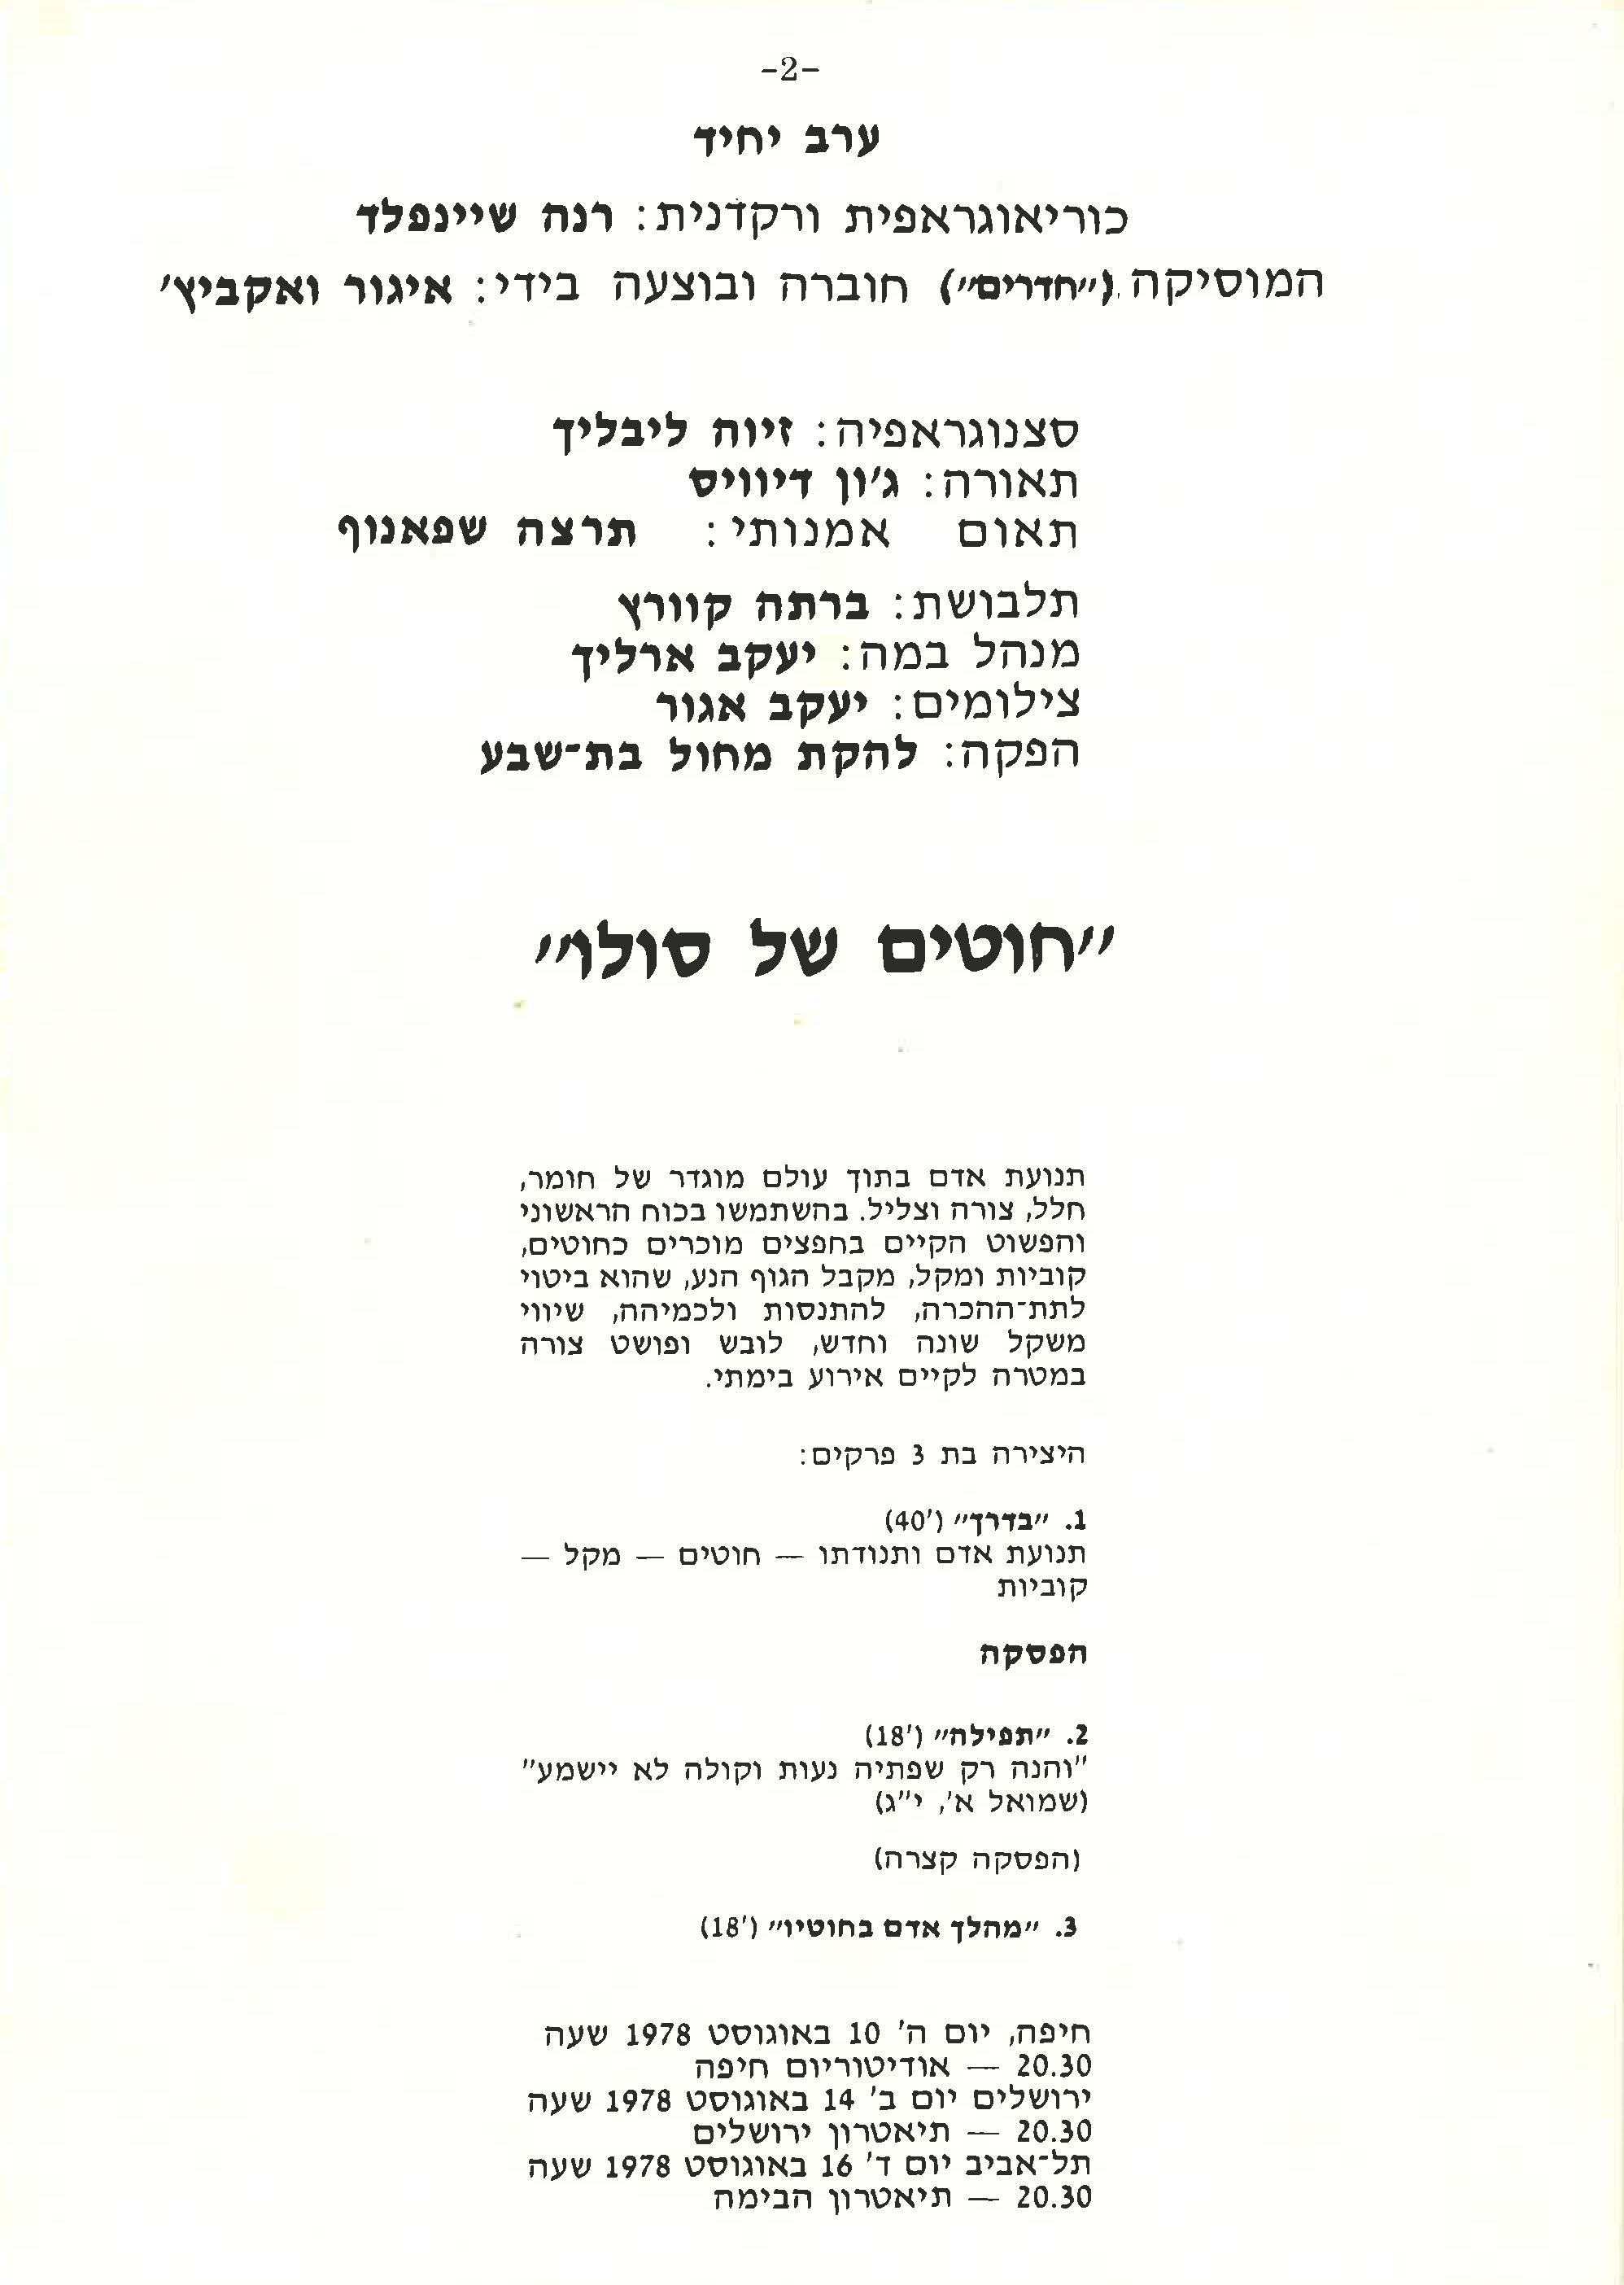 IN HEBREW PAGE 2 ISRAEL FESTIVAL PROGRAM .jpg